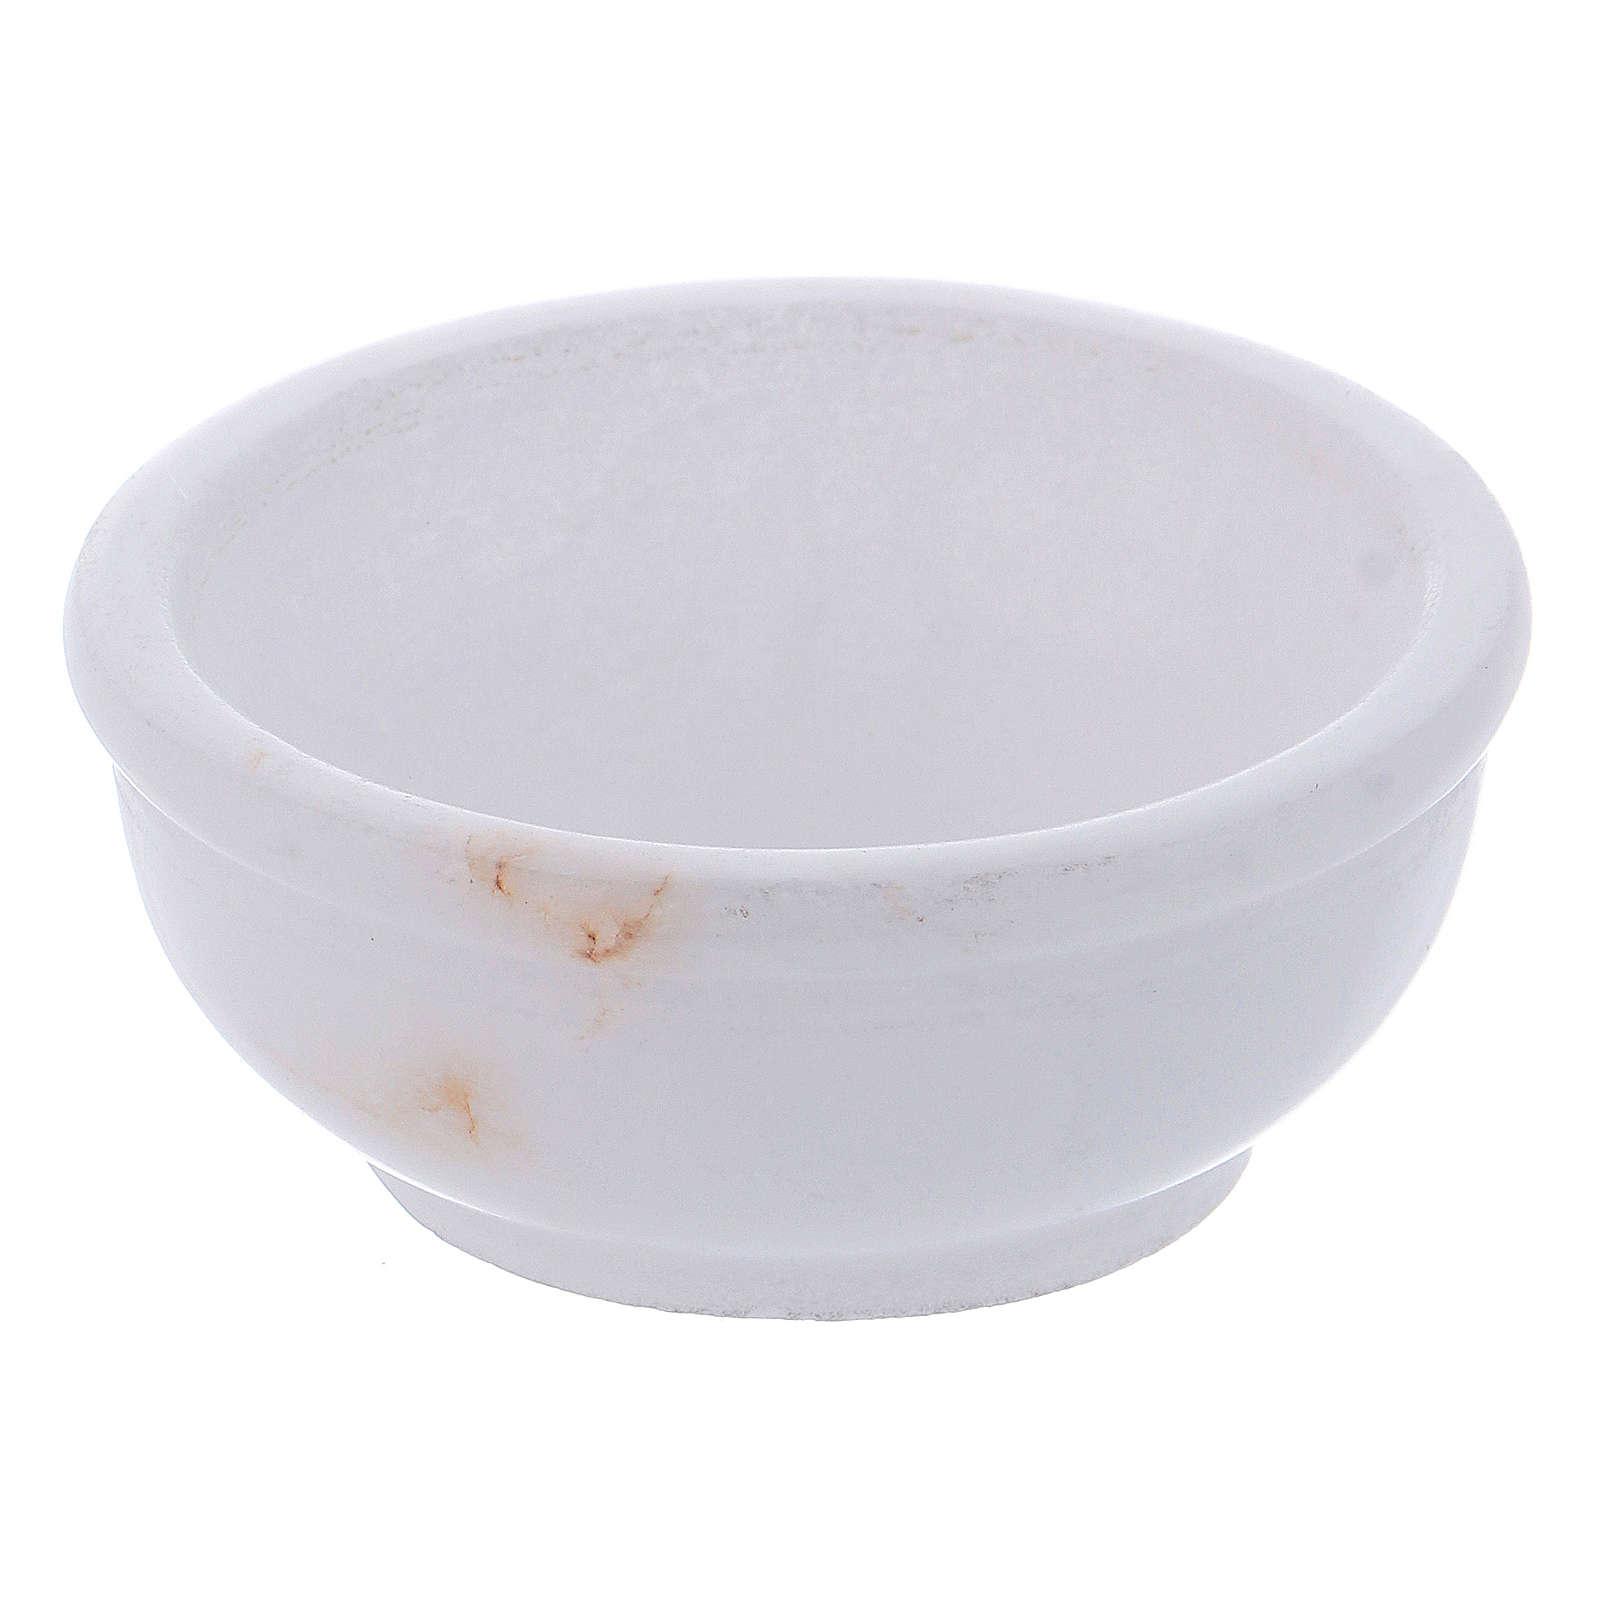 Ciotolina portaincenso pietra ollare bianca 6 cm 3